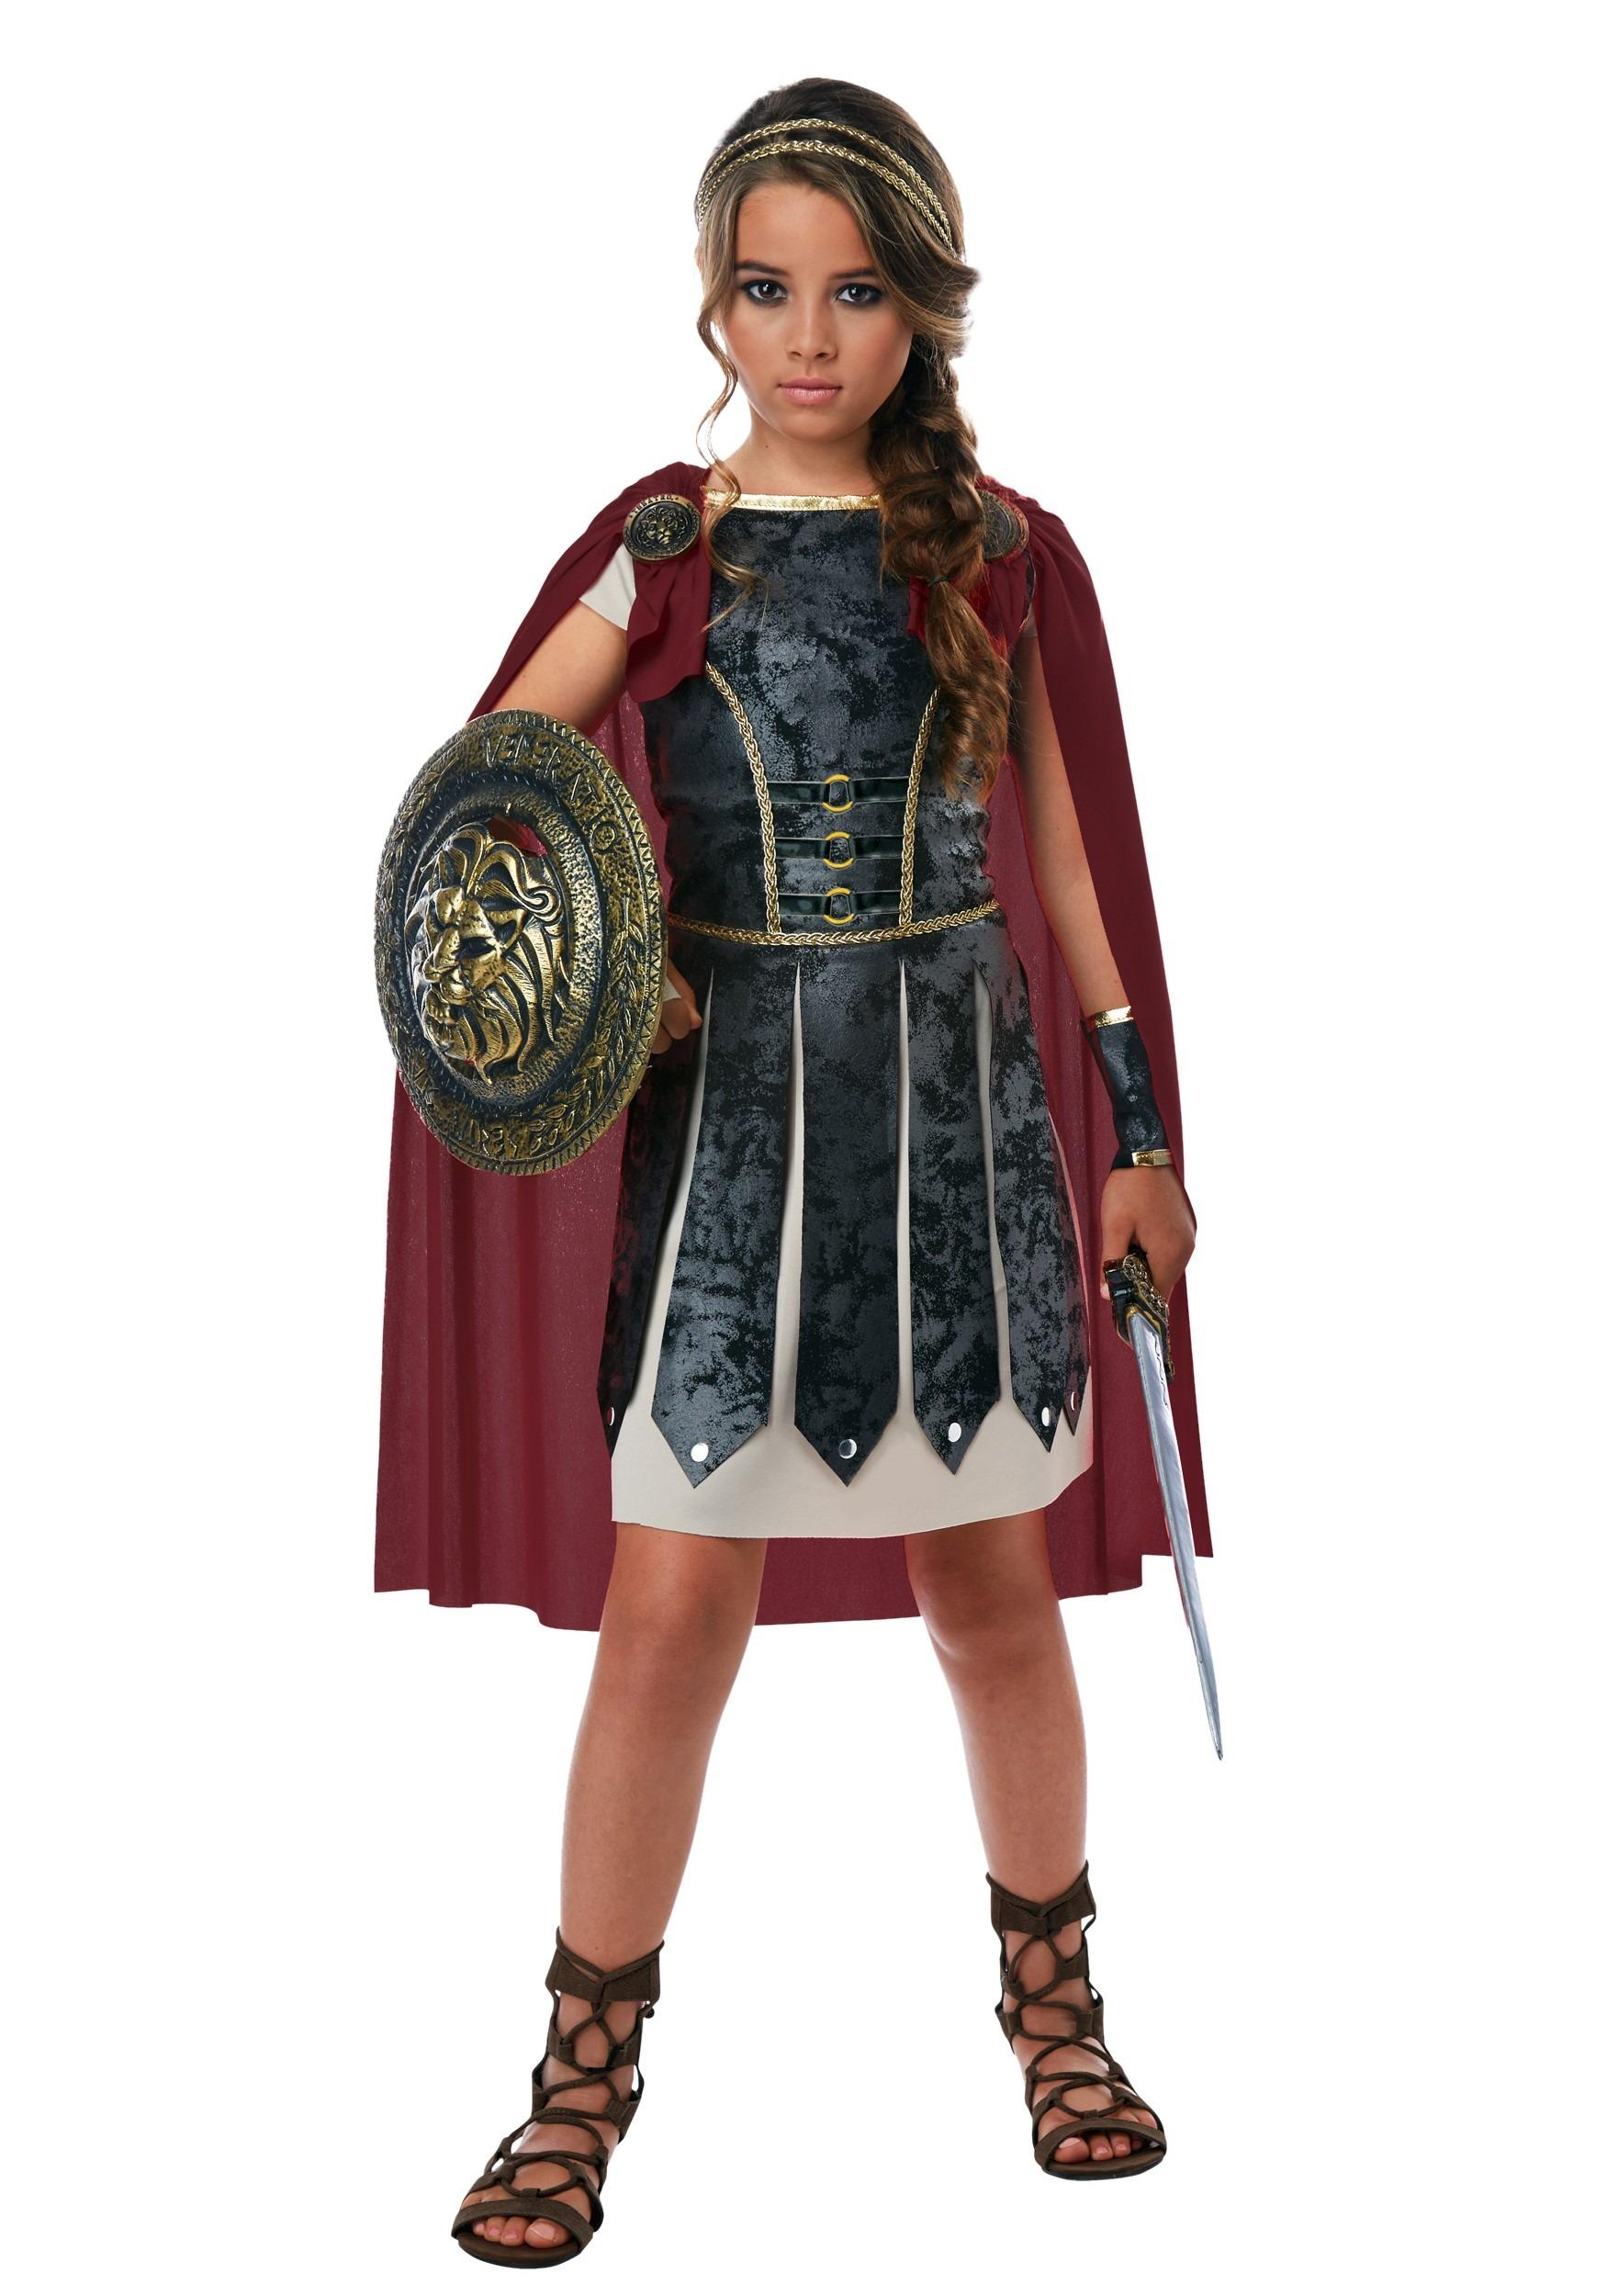 Fearless Gladiator Girls Costume-update1  sc 1 st  Halloween Costumes & Fearless Gladiator Costume for Girls